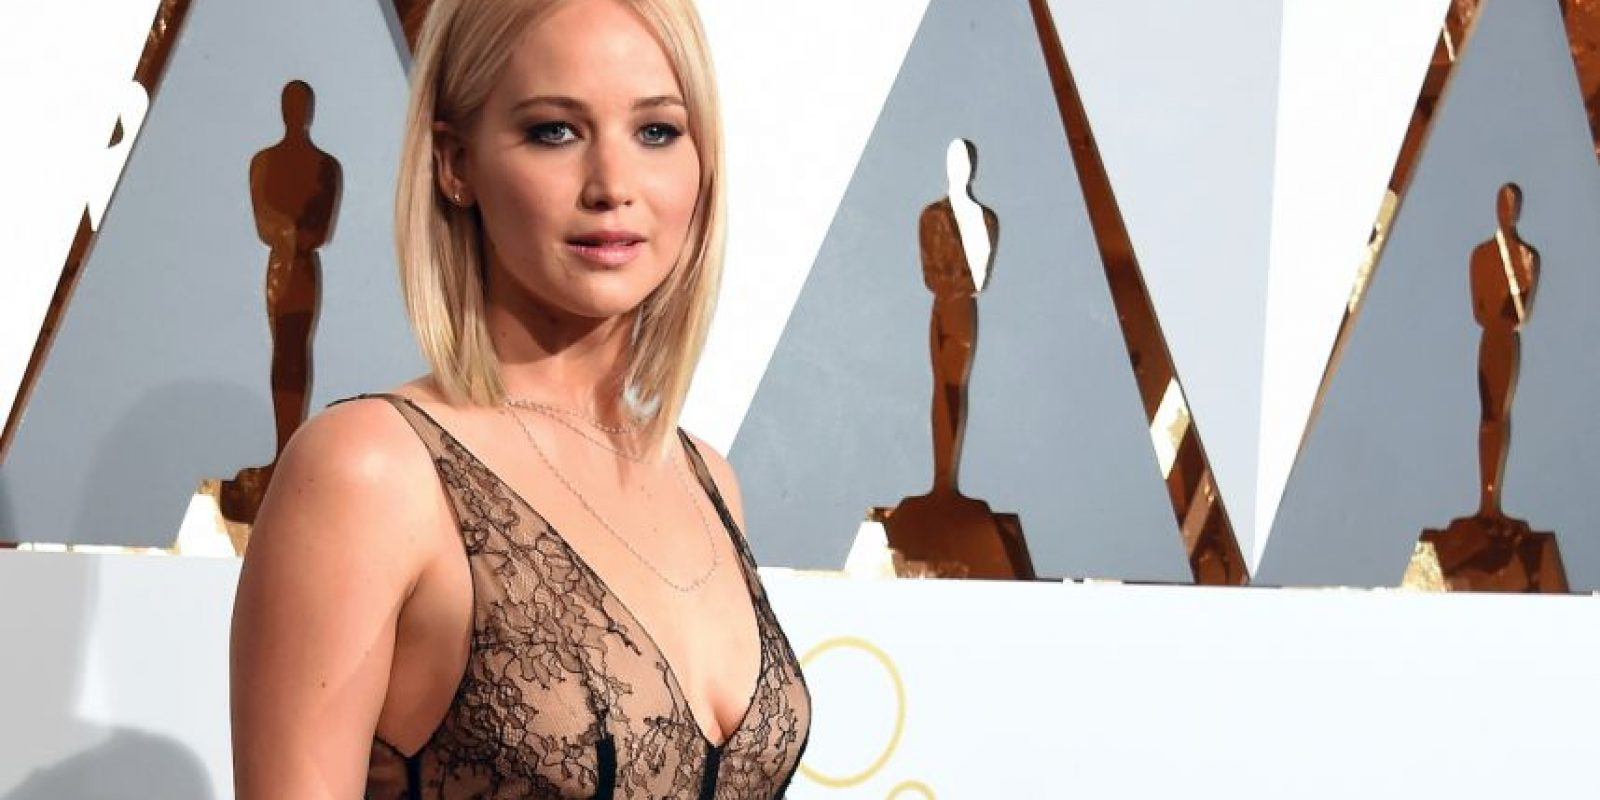 """Ya me cansé de ser ""adorable"" al expresar mi opinión"", Jennifer Lawrence Foto:Getty Images"